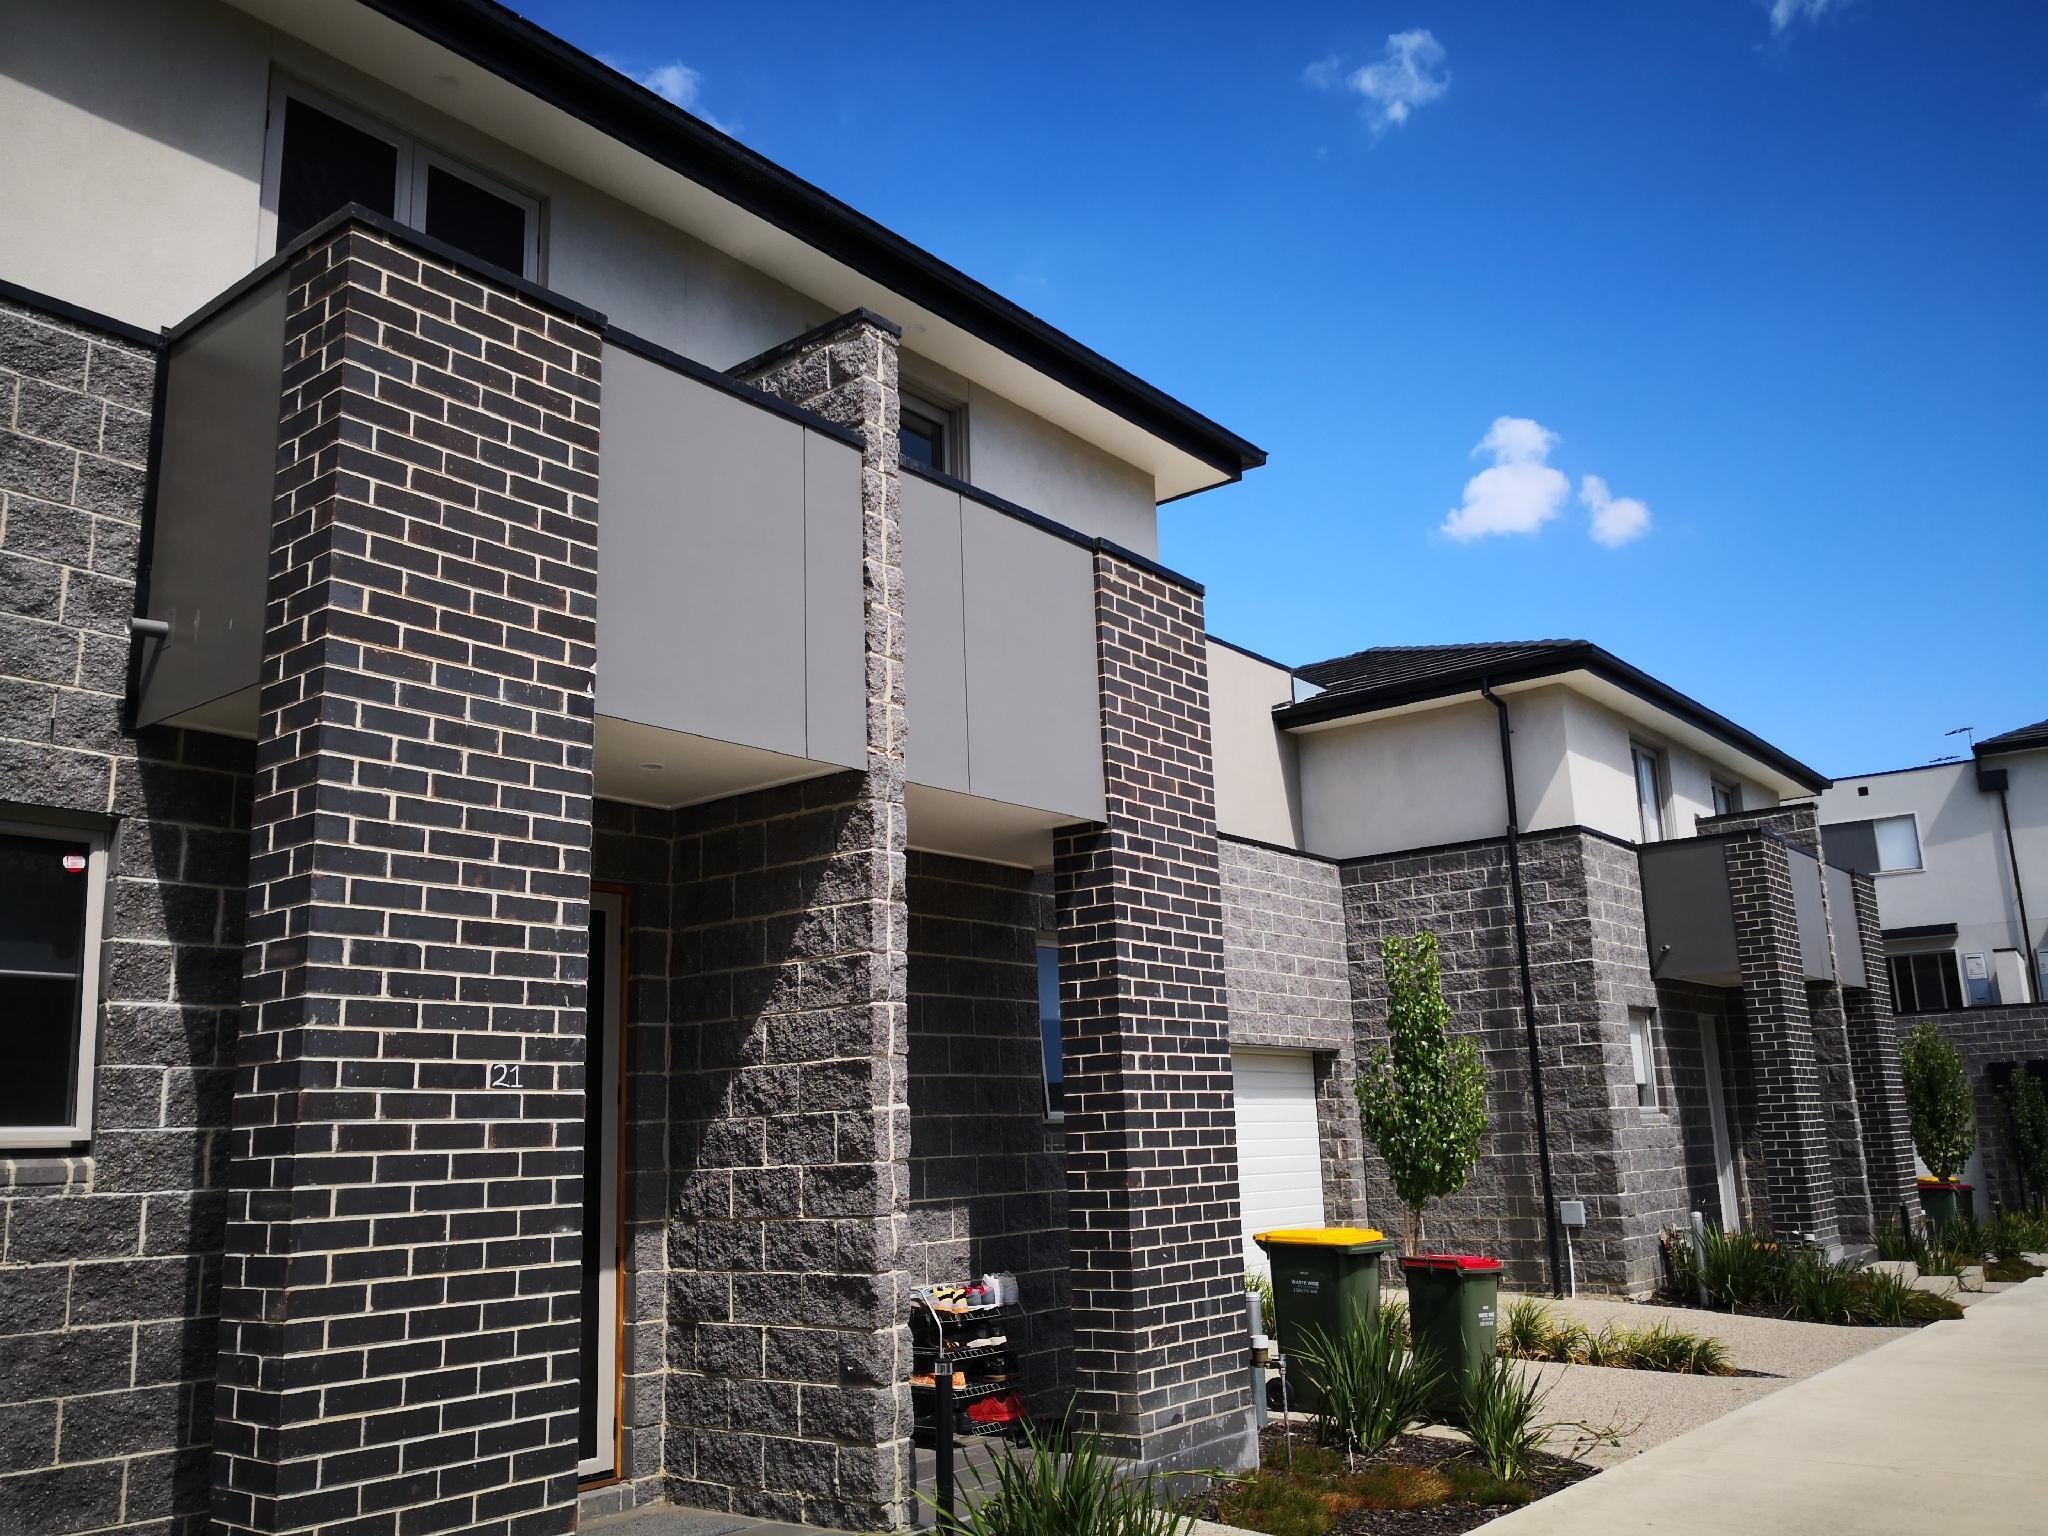 Delicate And Peaceful Bundoora Townhouse 11